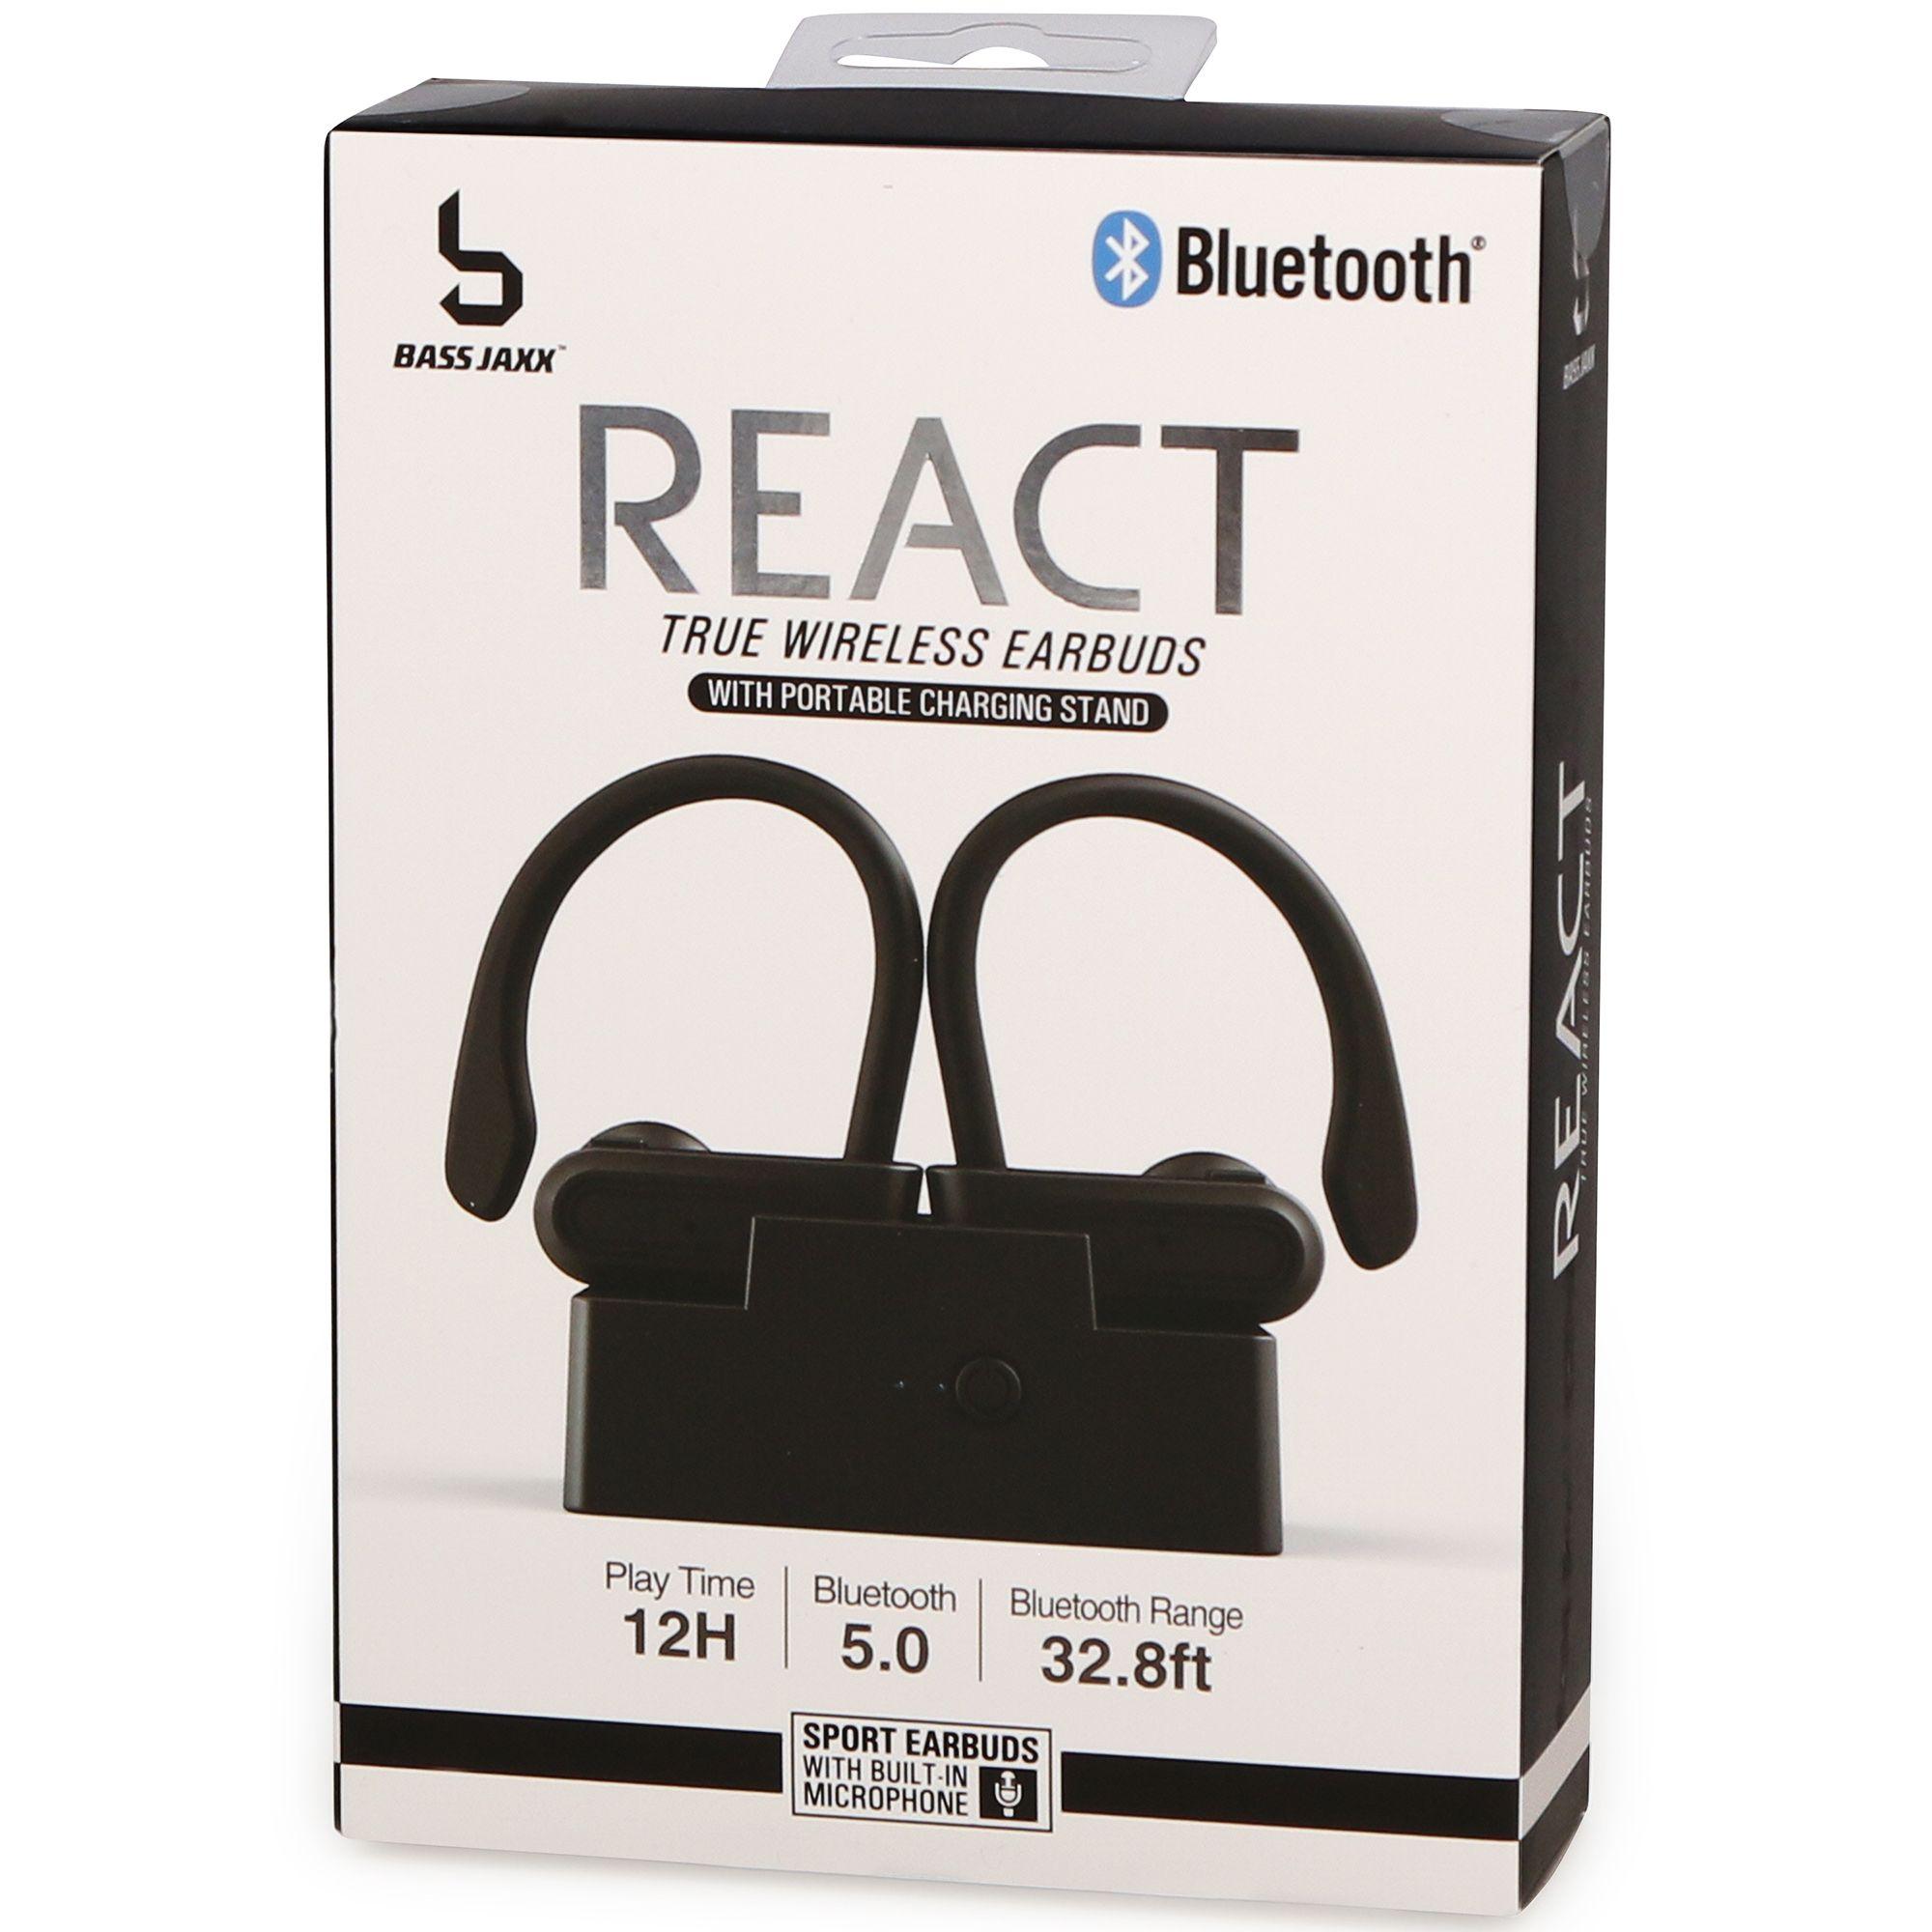 React True Wireless Bluetooth Sport Earbuds W Mic Charging Stand Sport Earbuds Earbuds Wireless Bluetooth